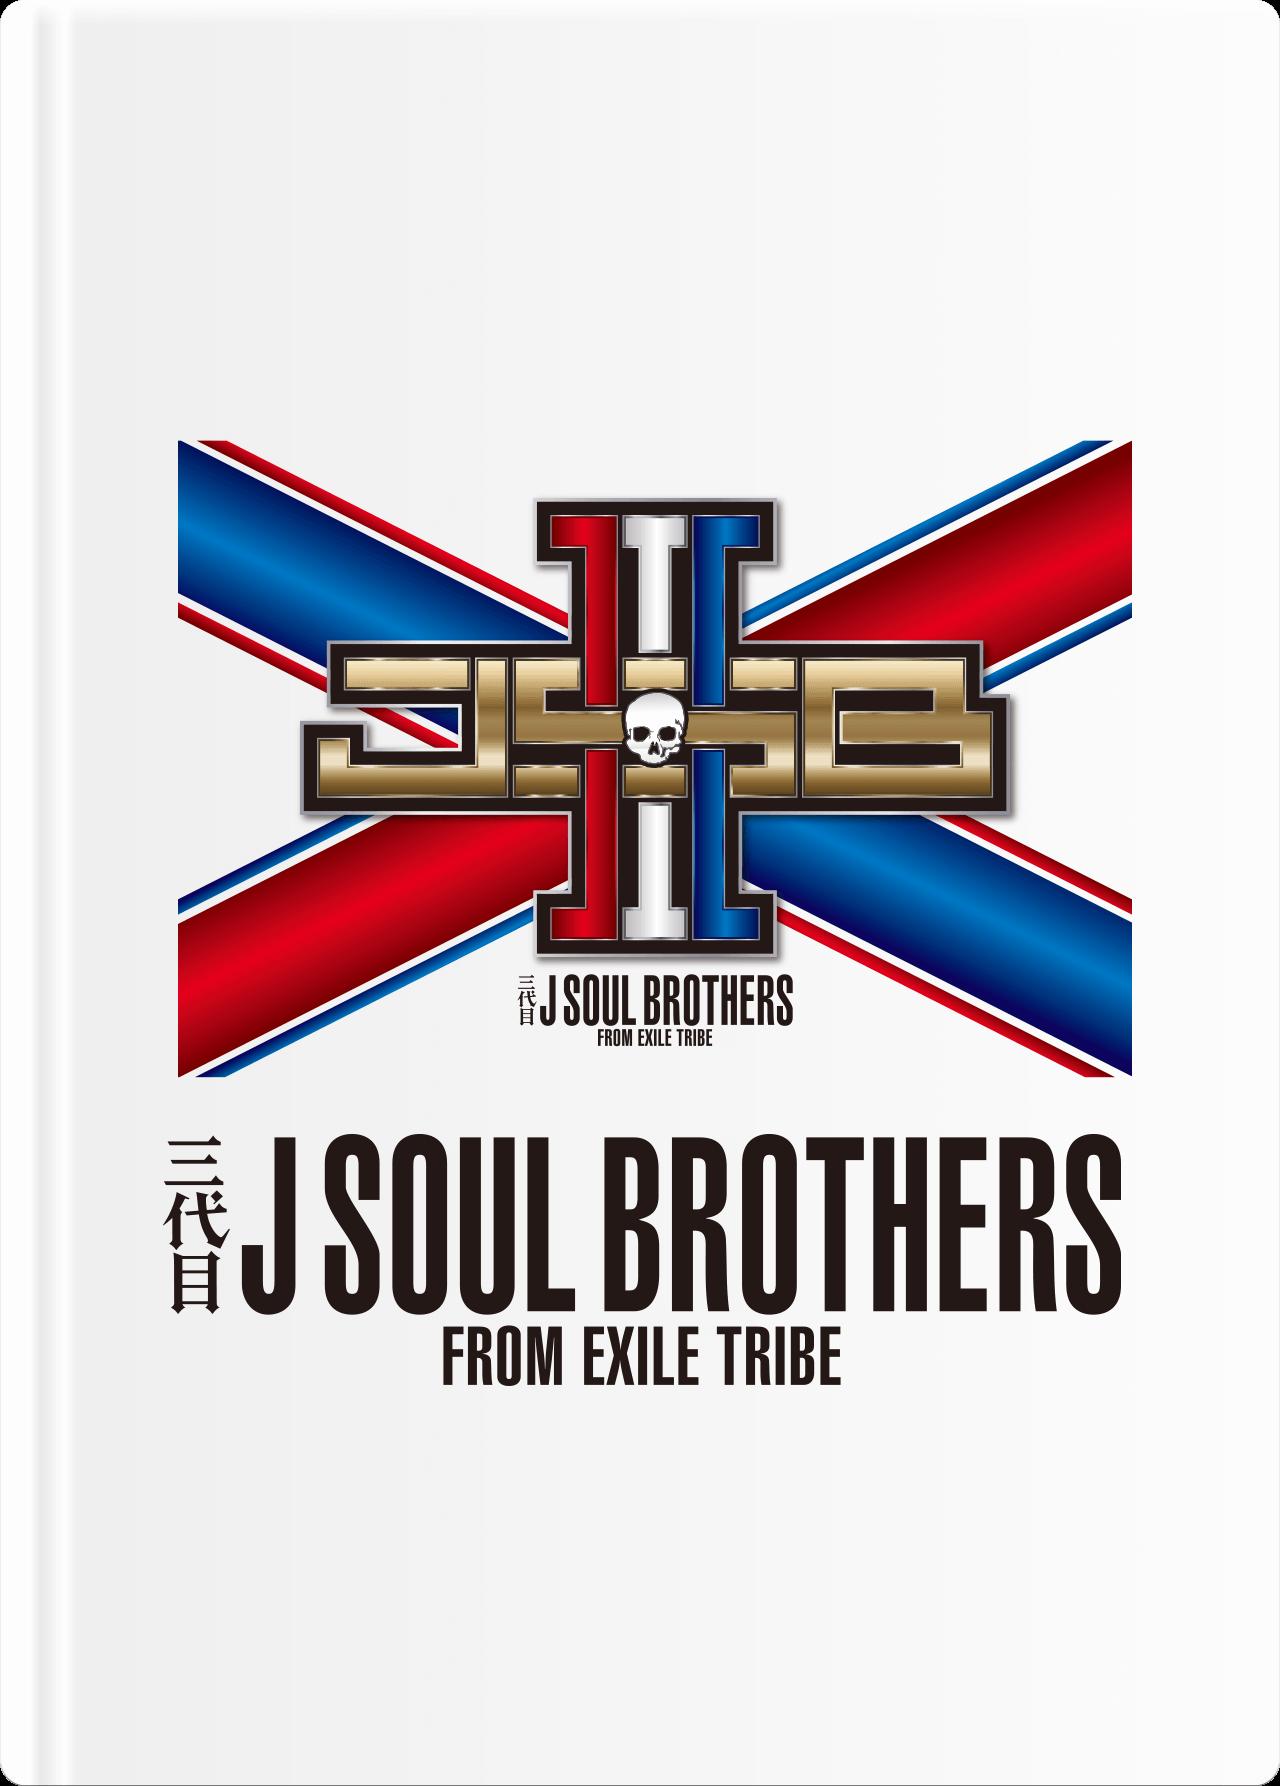 三代目 J Soul Brothers 画像 壁紙 三代目 J Soul Brothers 画像 壁紙 あなたのための最高の壁紙画像